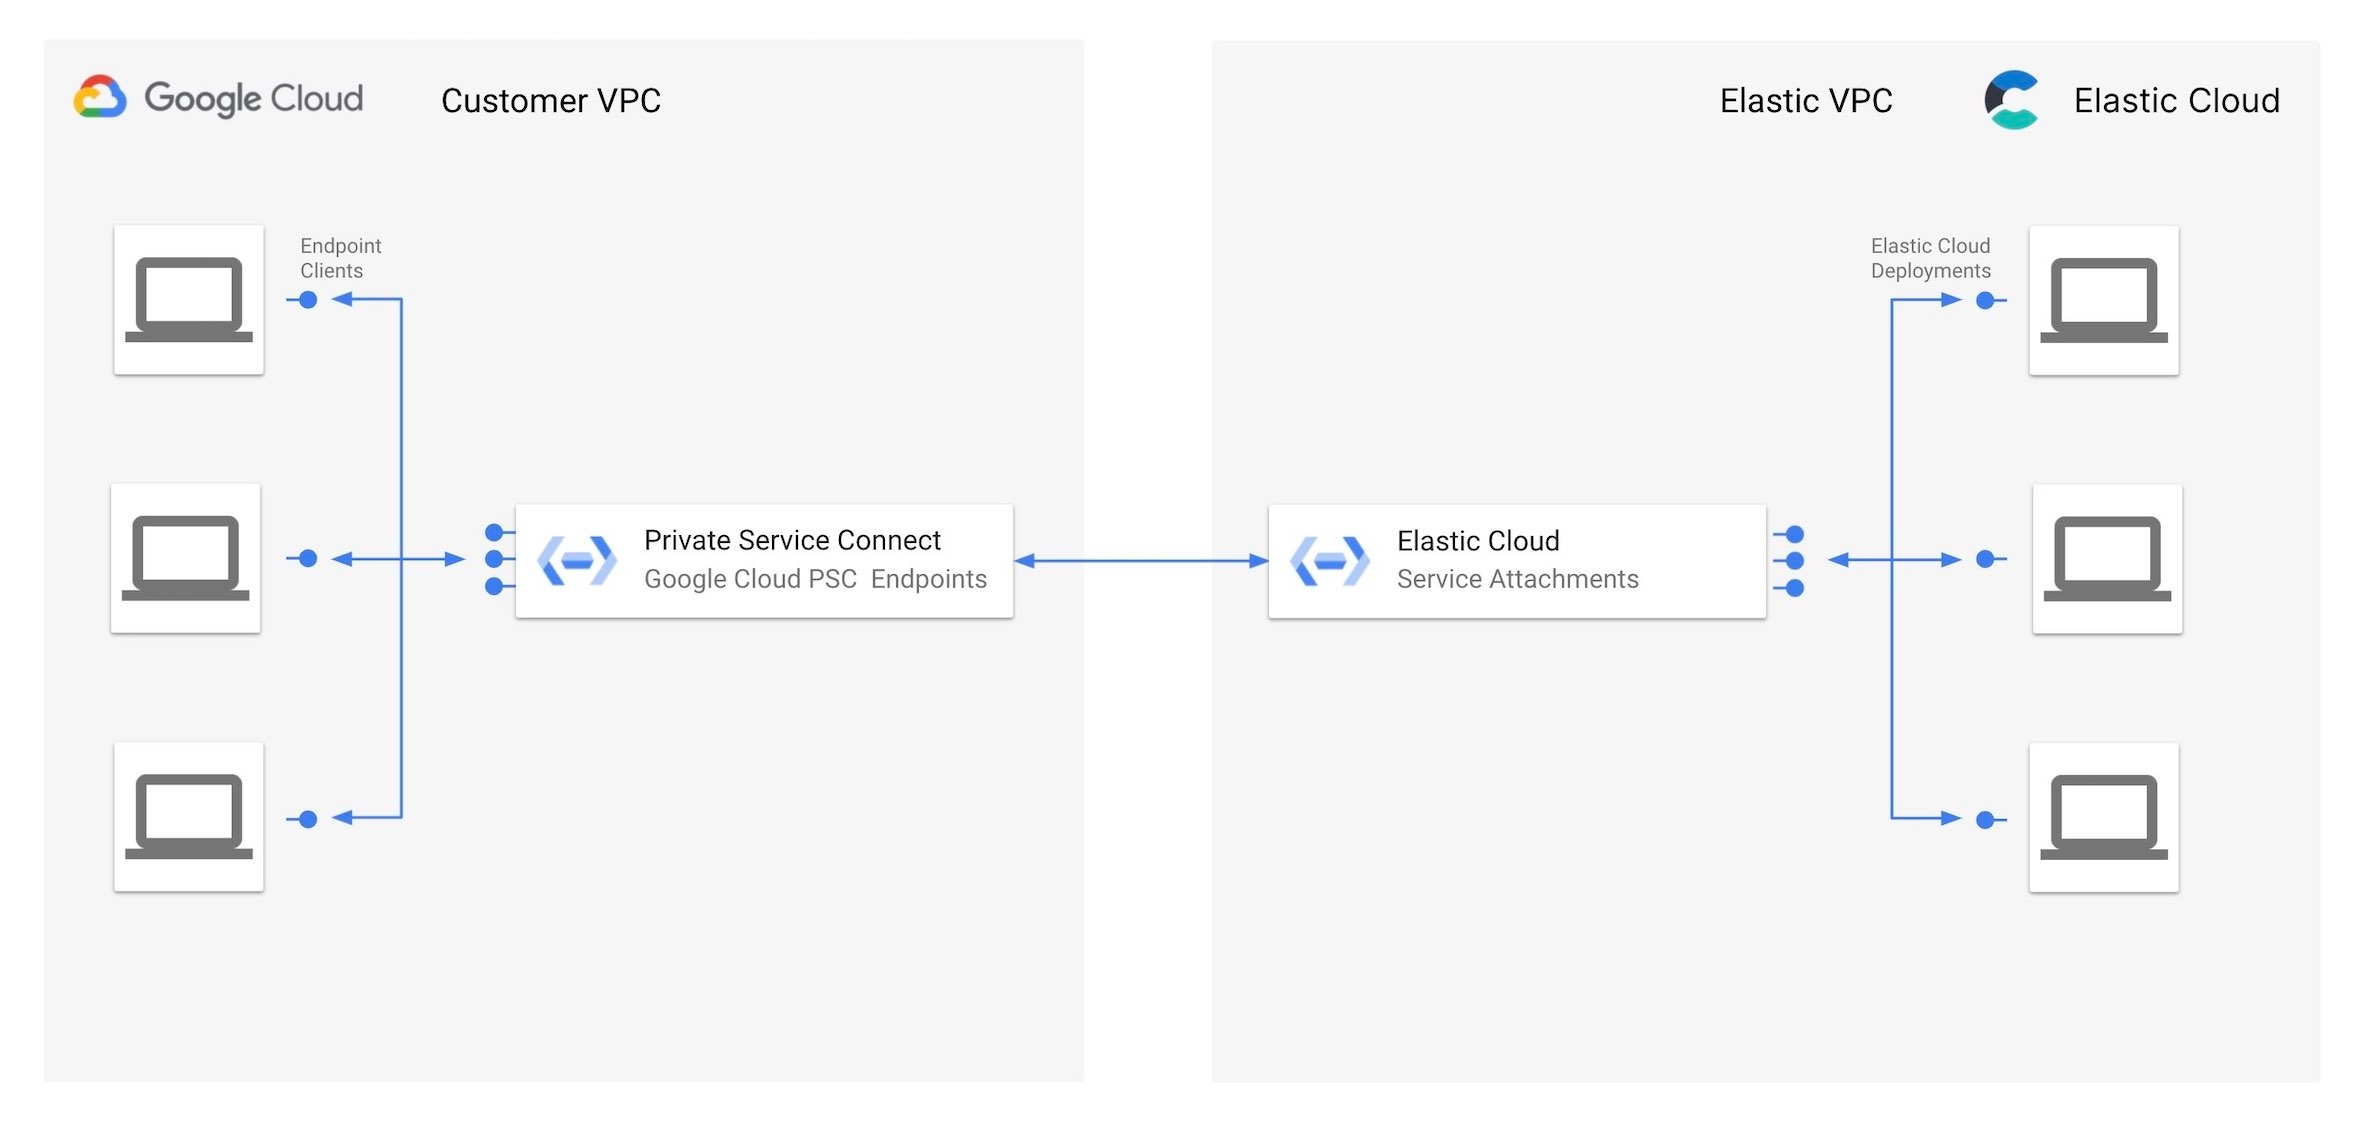 Google Private Service Connect 既能对 Elastic Cloud 终端部署提供轻松的专属访问,又能将所有流量保持在 Google 网络内